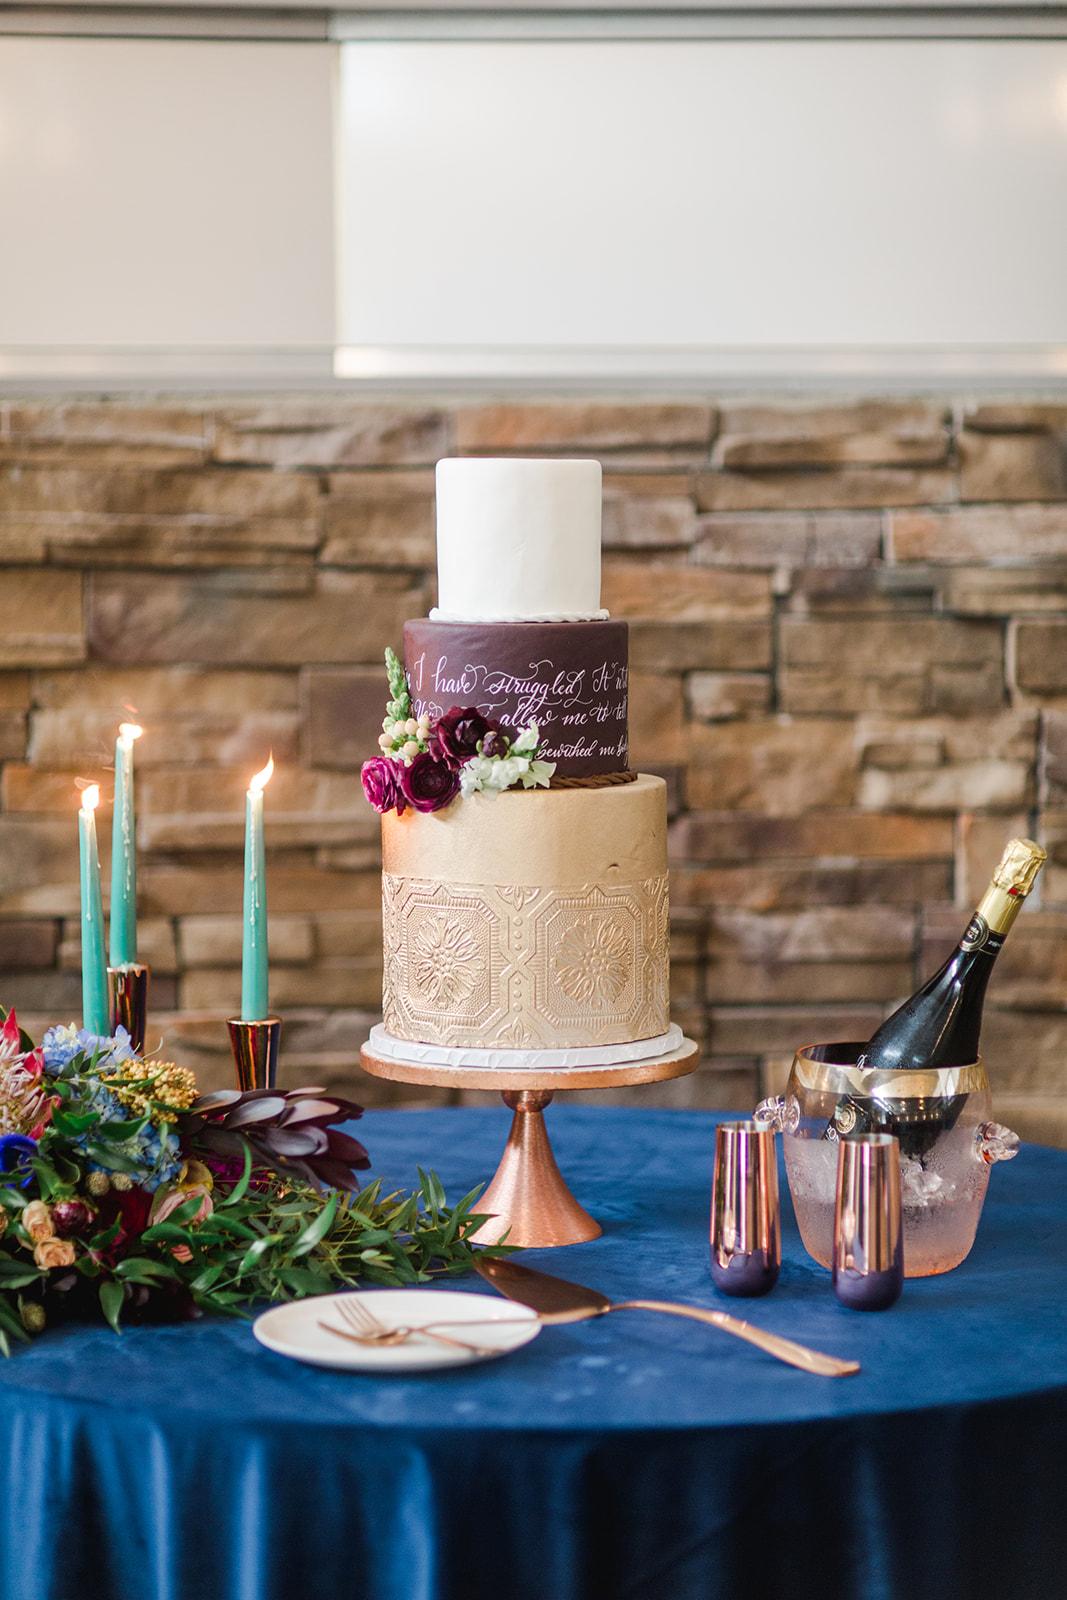 Calligraphy cake design